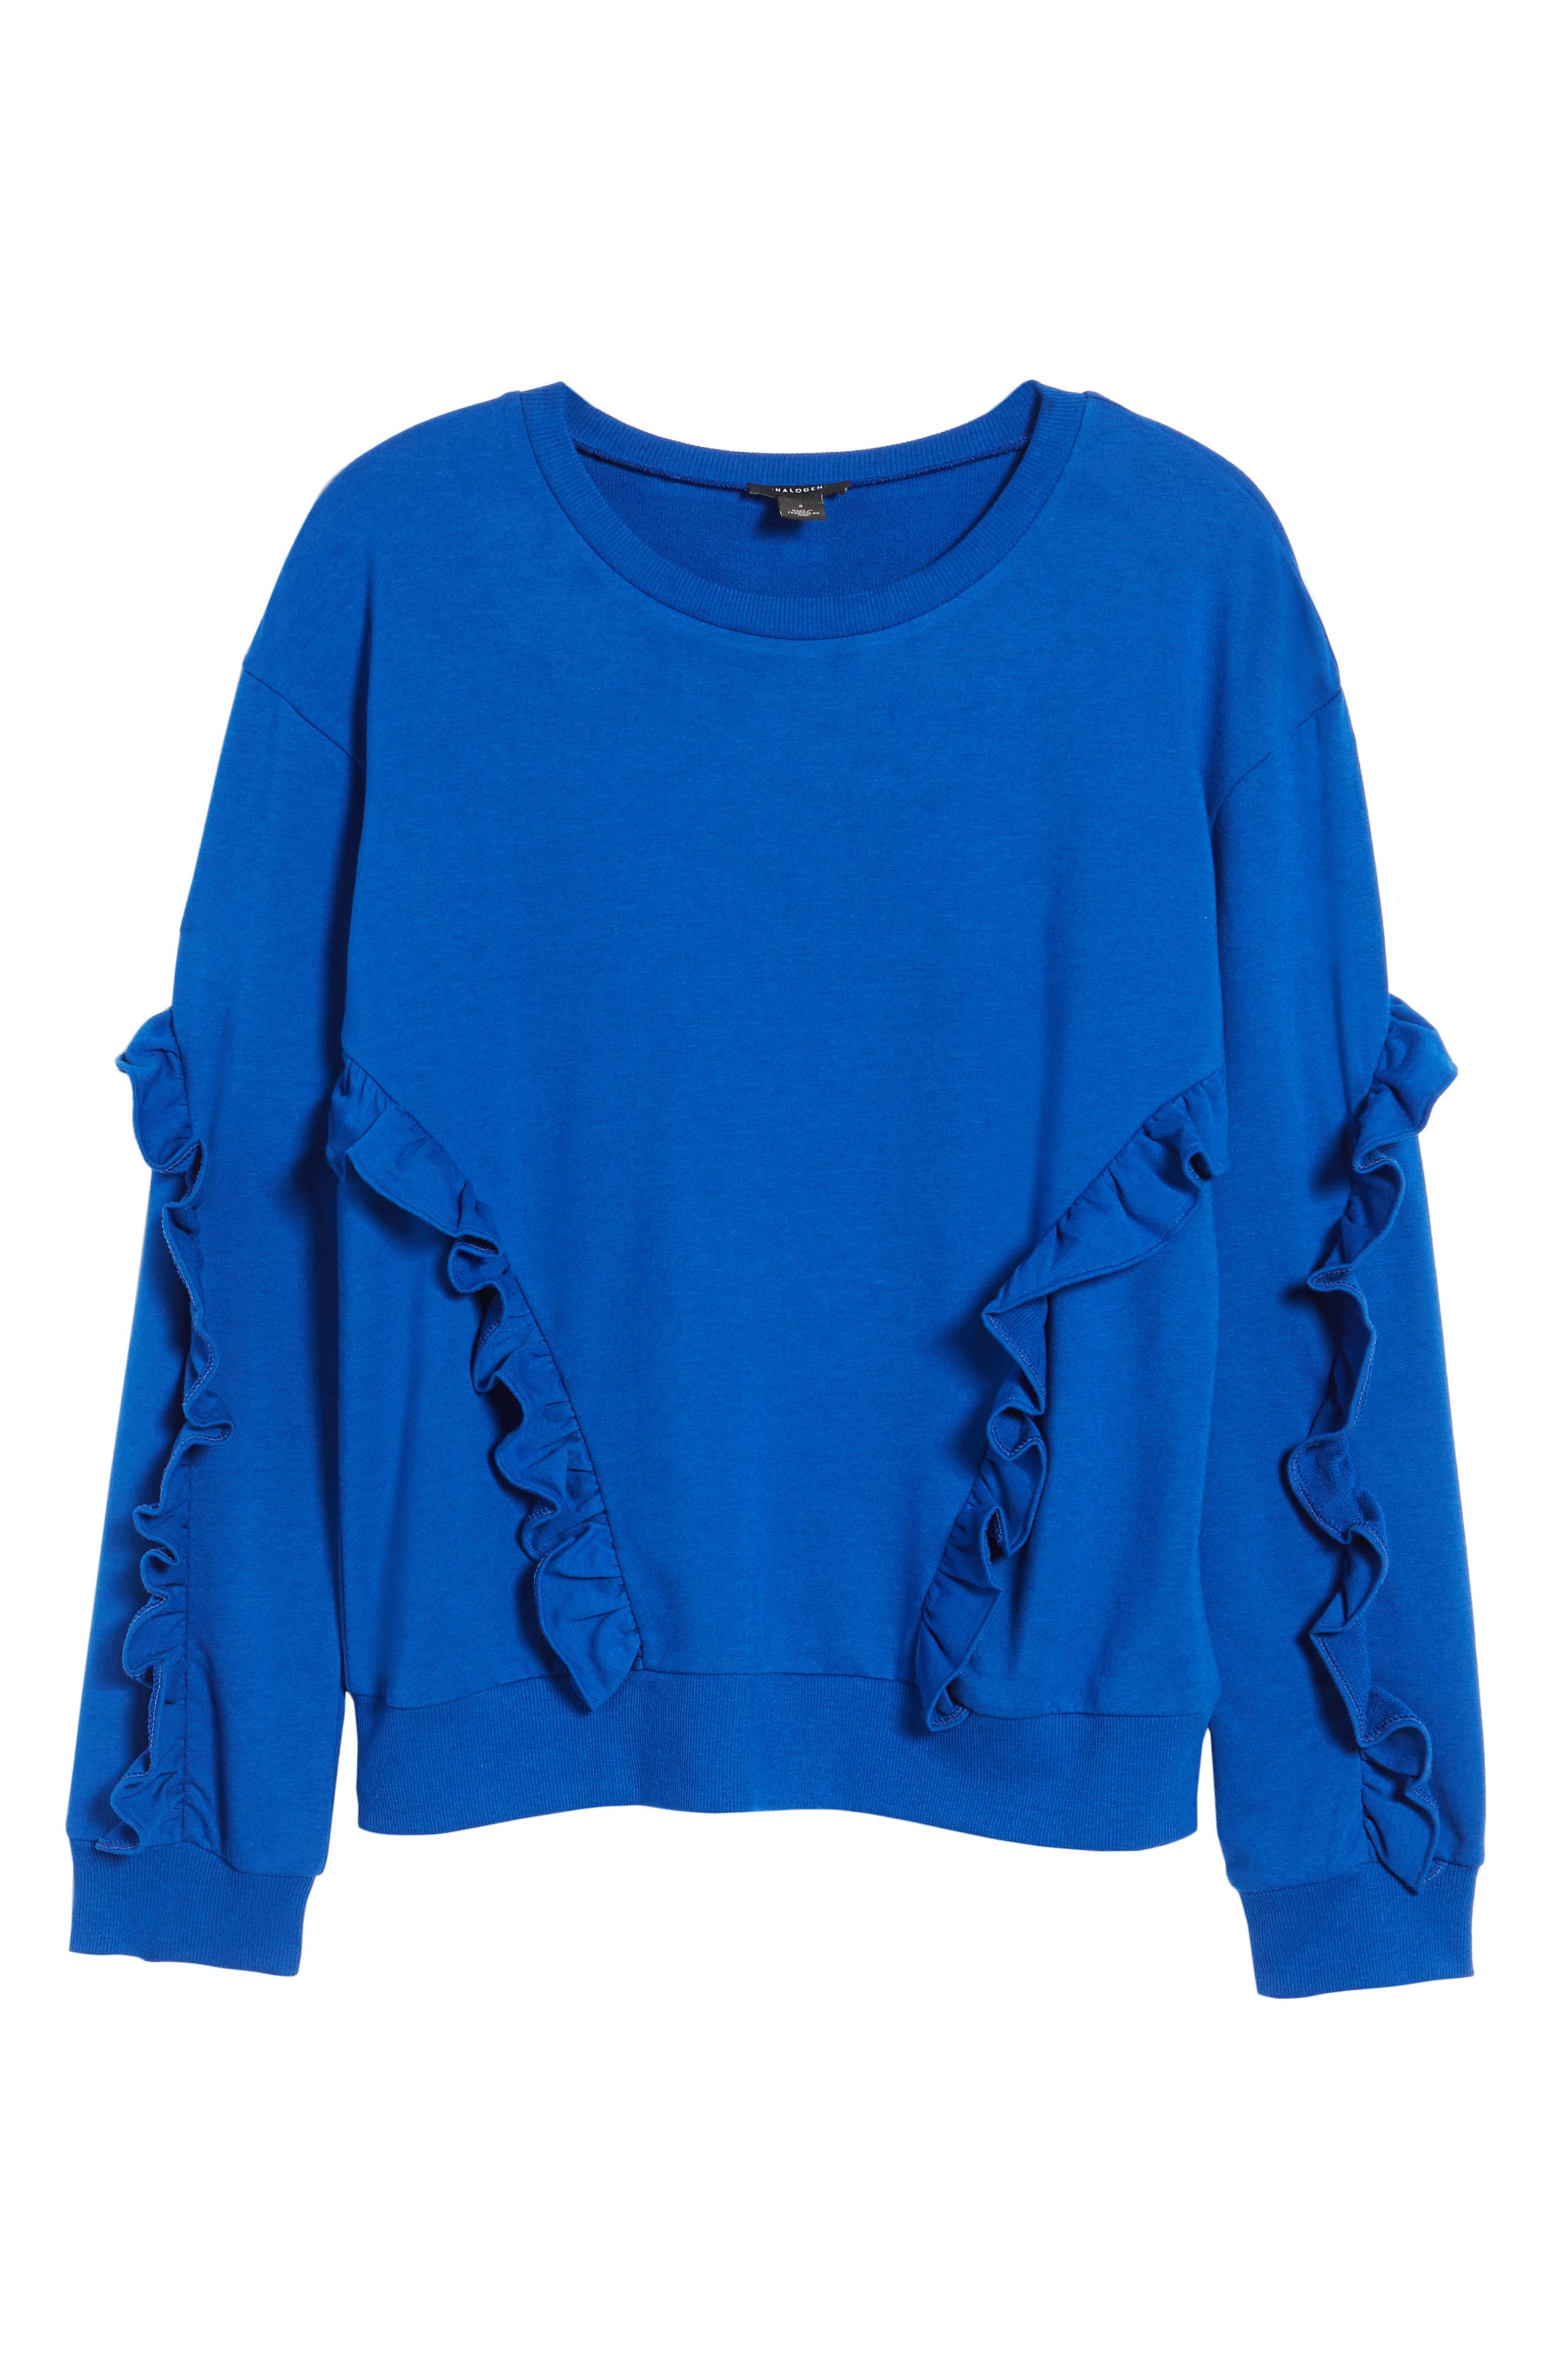 Ruffle Detail Sweatshirt,                             Alternate thumbnail 6, color,                             Blue Surf